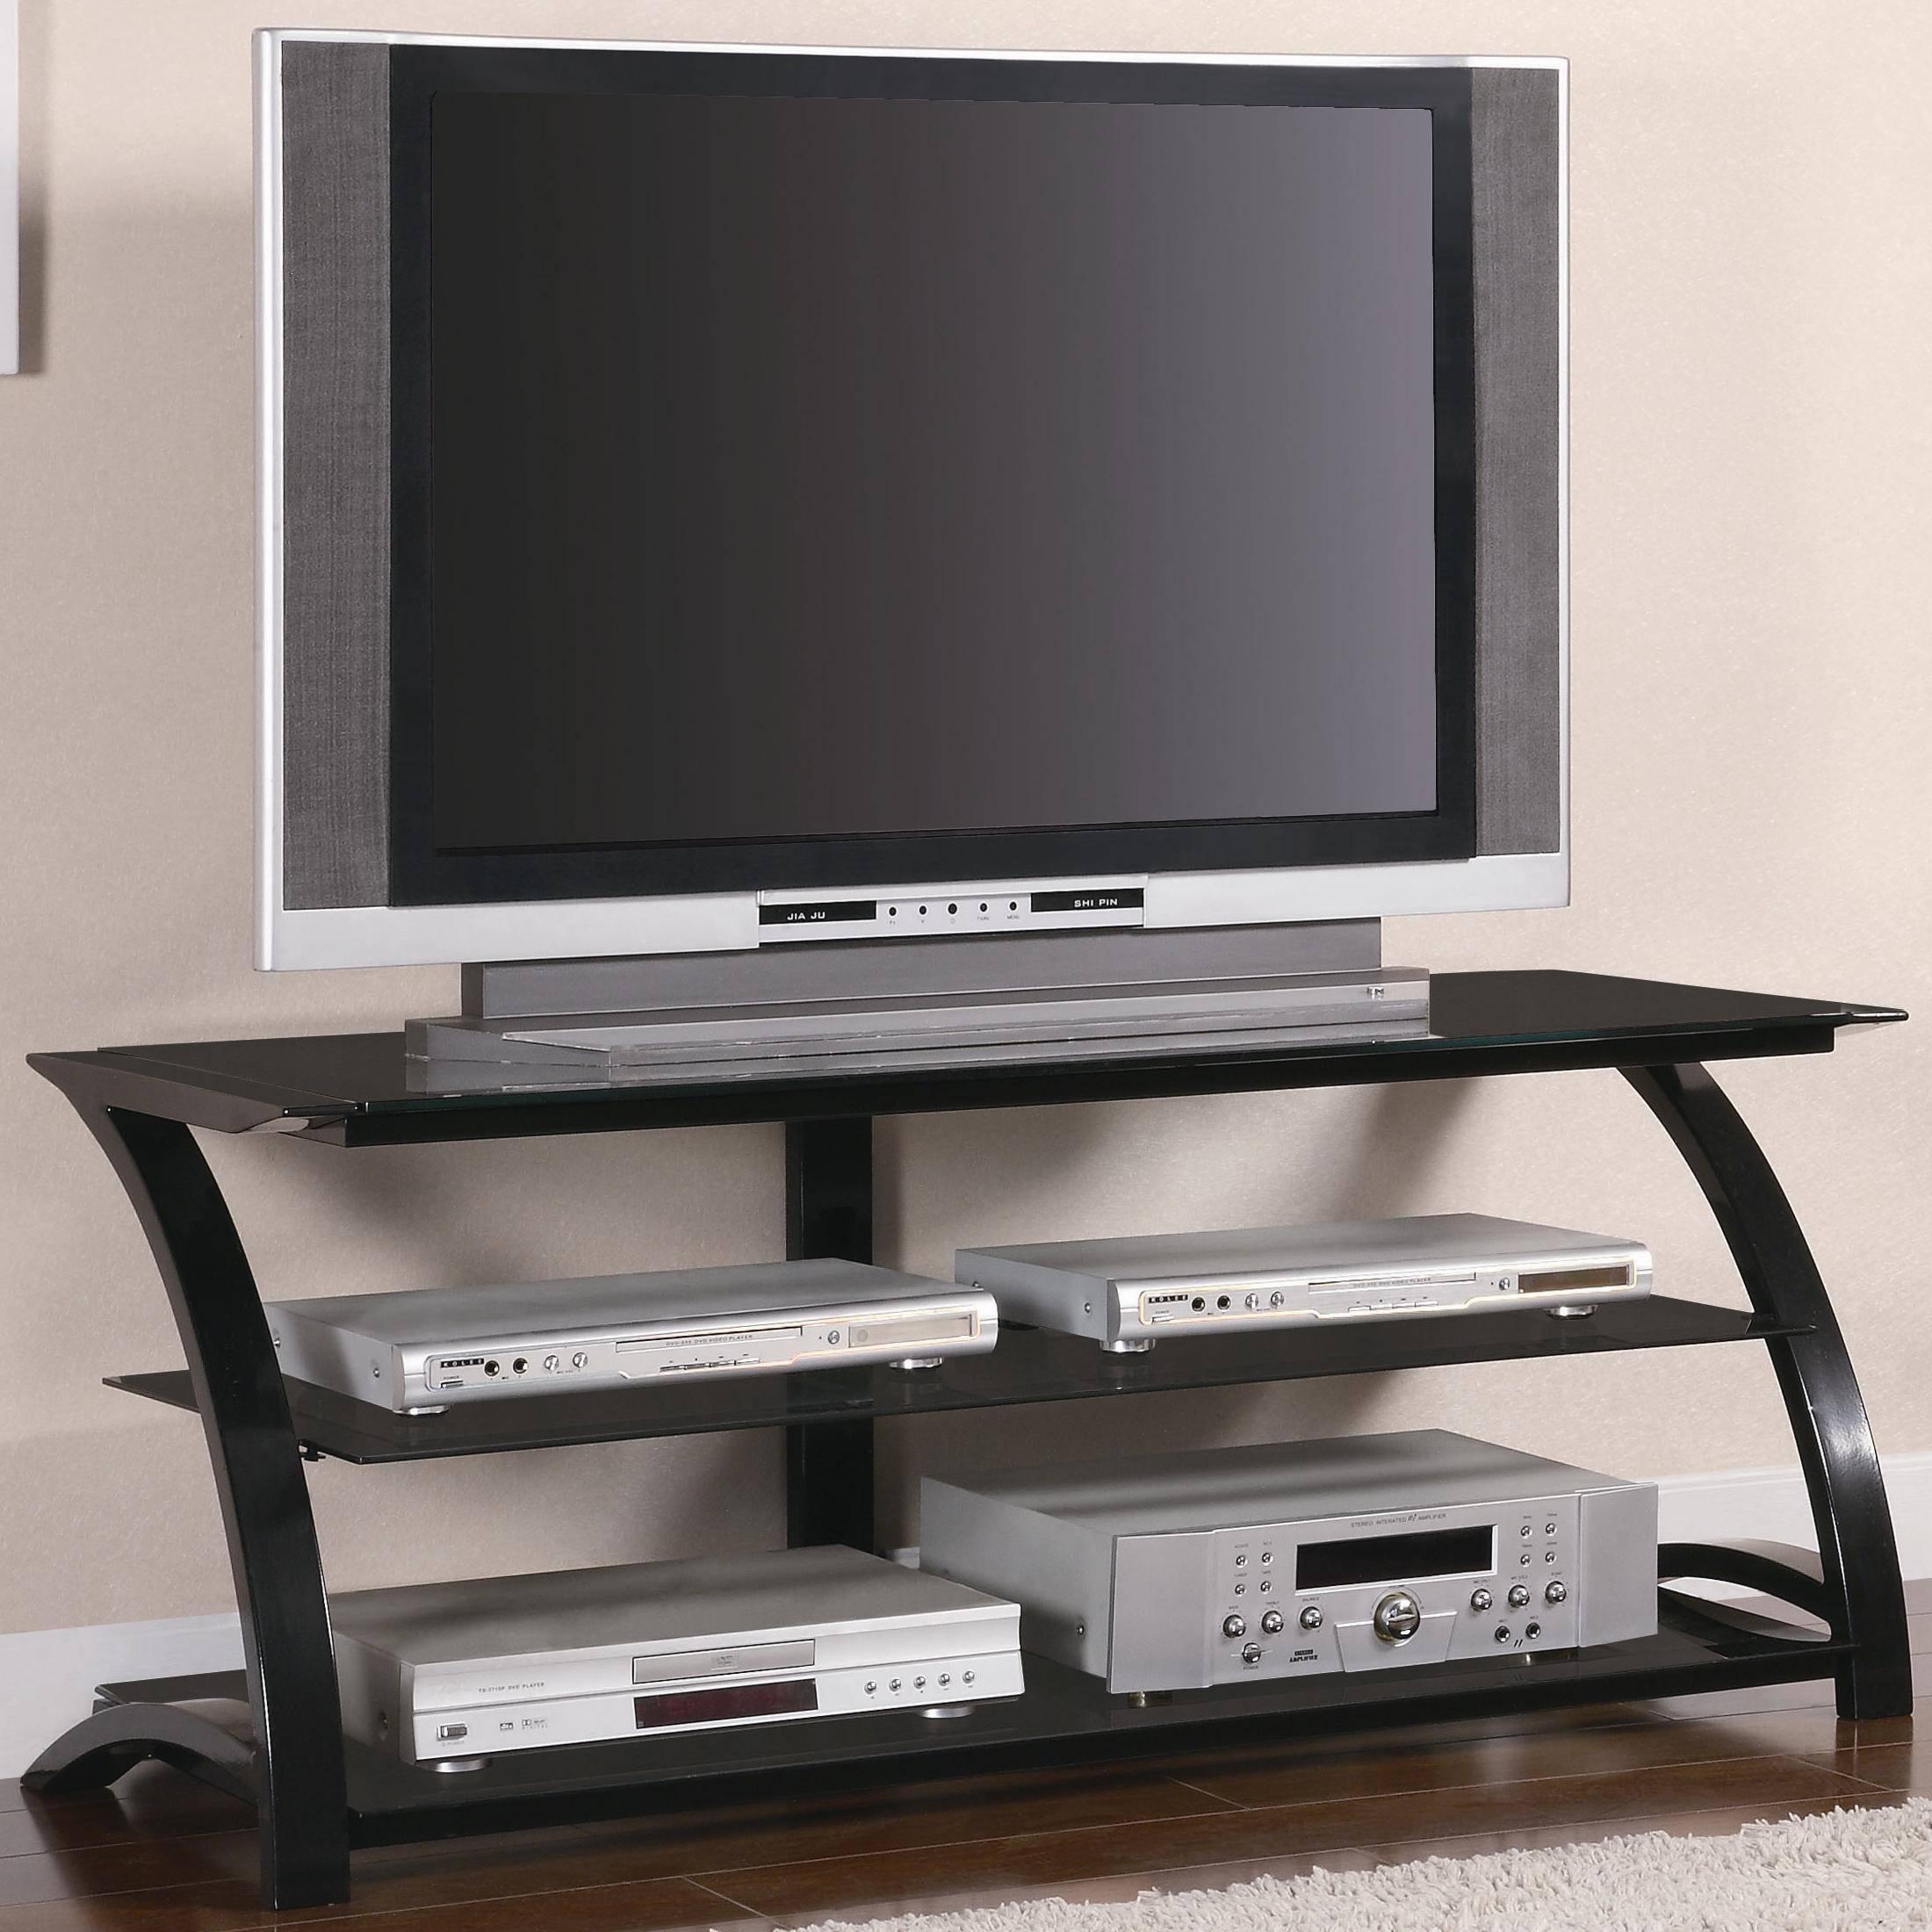 Tv, Television Stands | Austin's Furniture Depot regarding Como Tv Stands (Image 15 of 15)